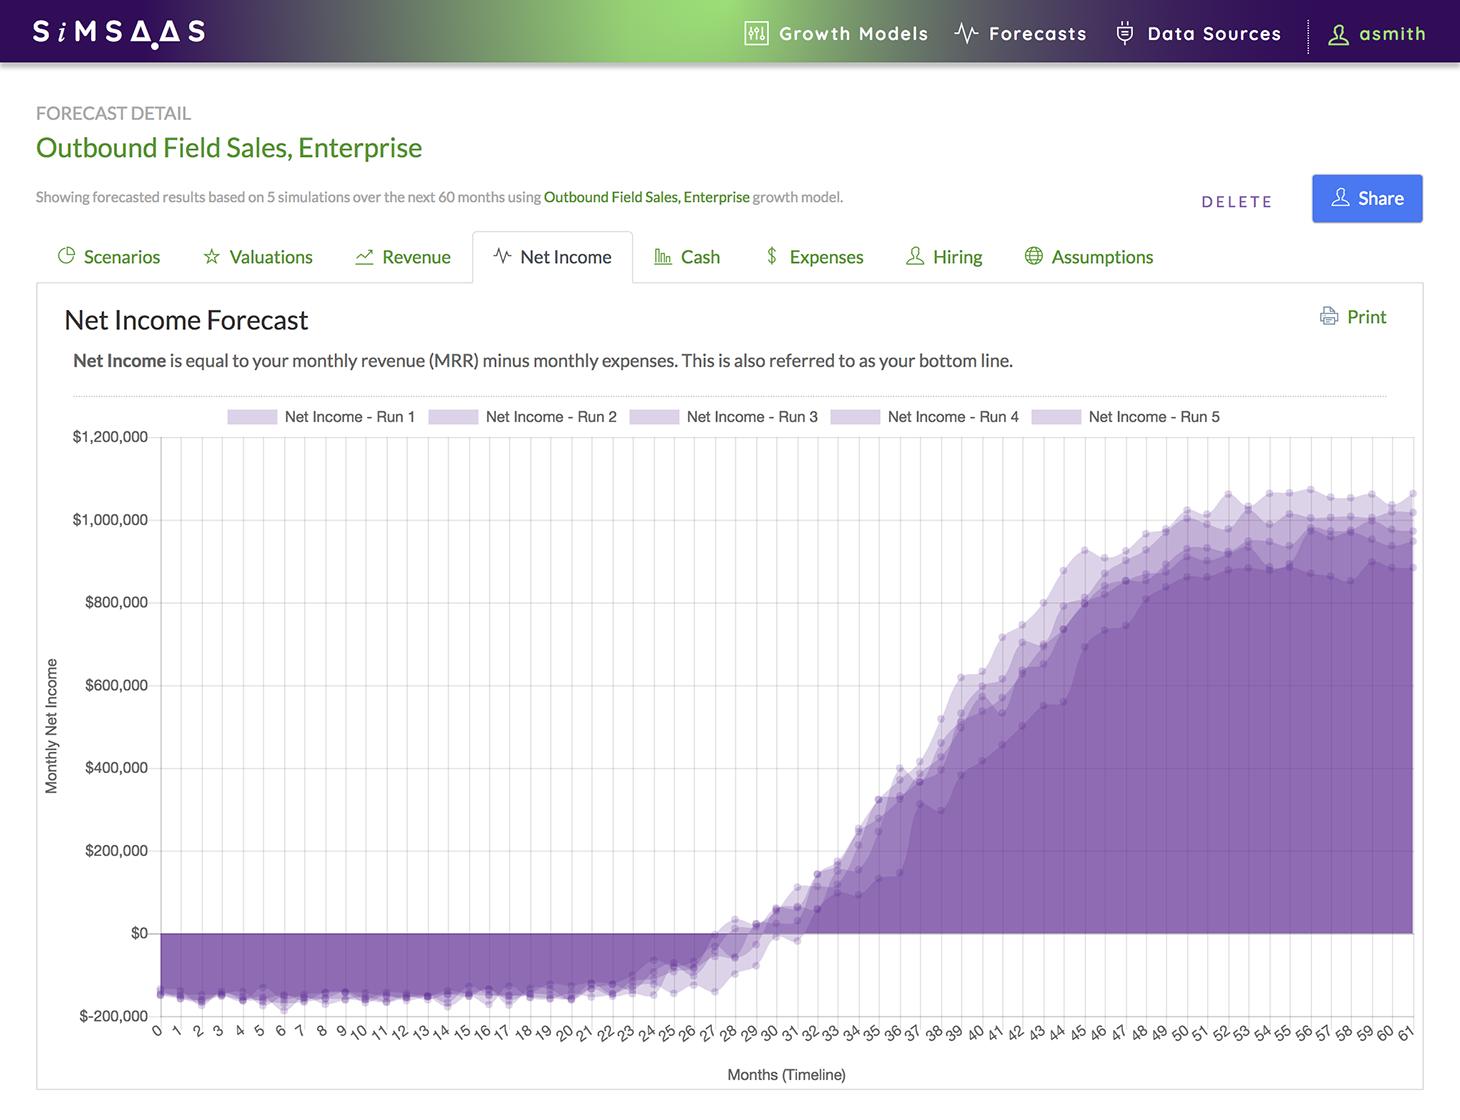 SimSaaS Net Income Forecast Chart